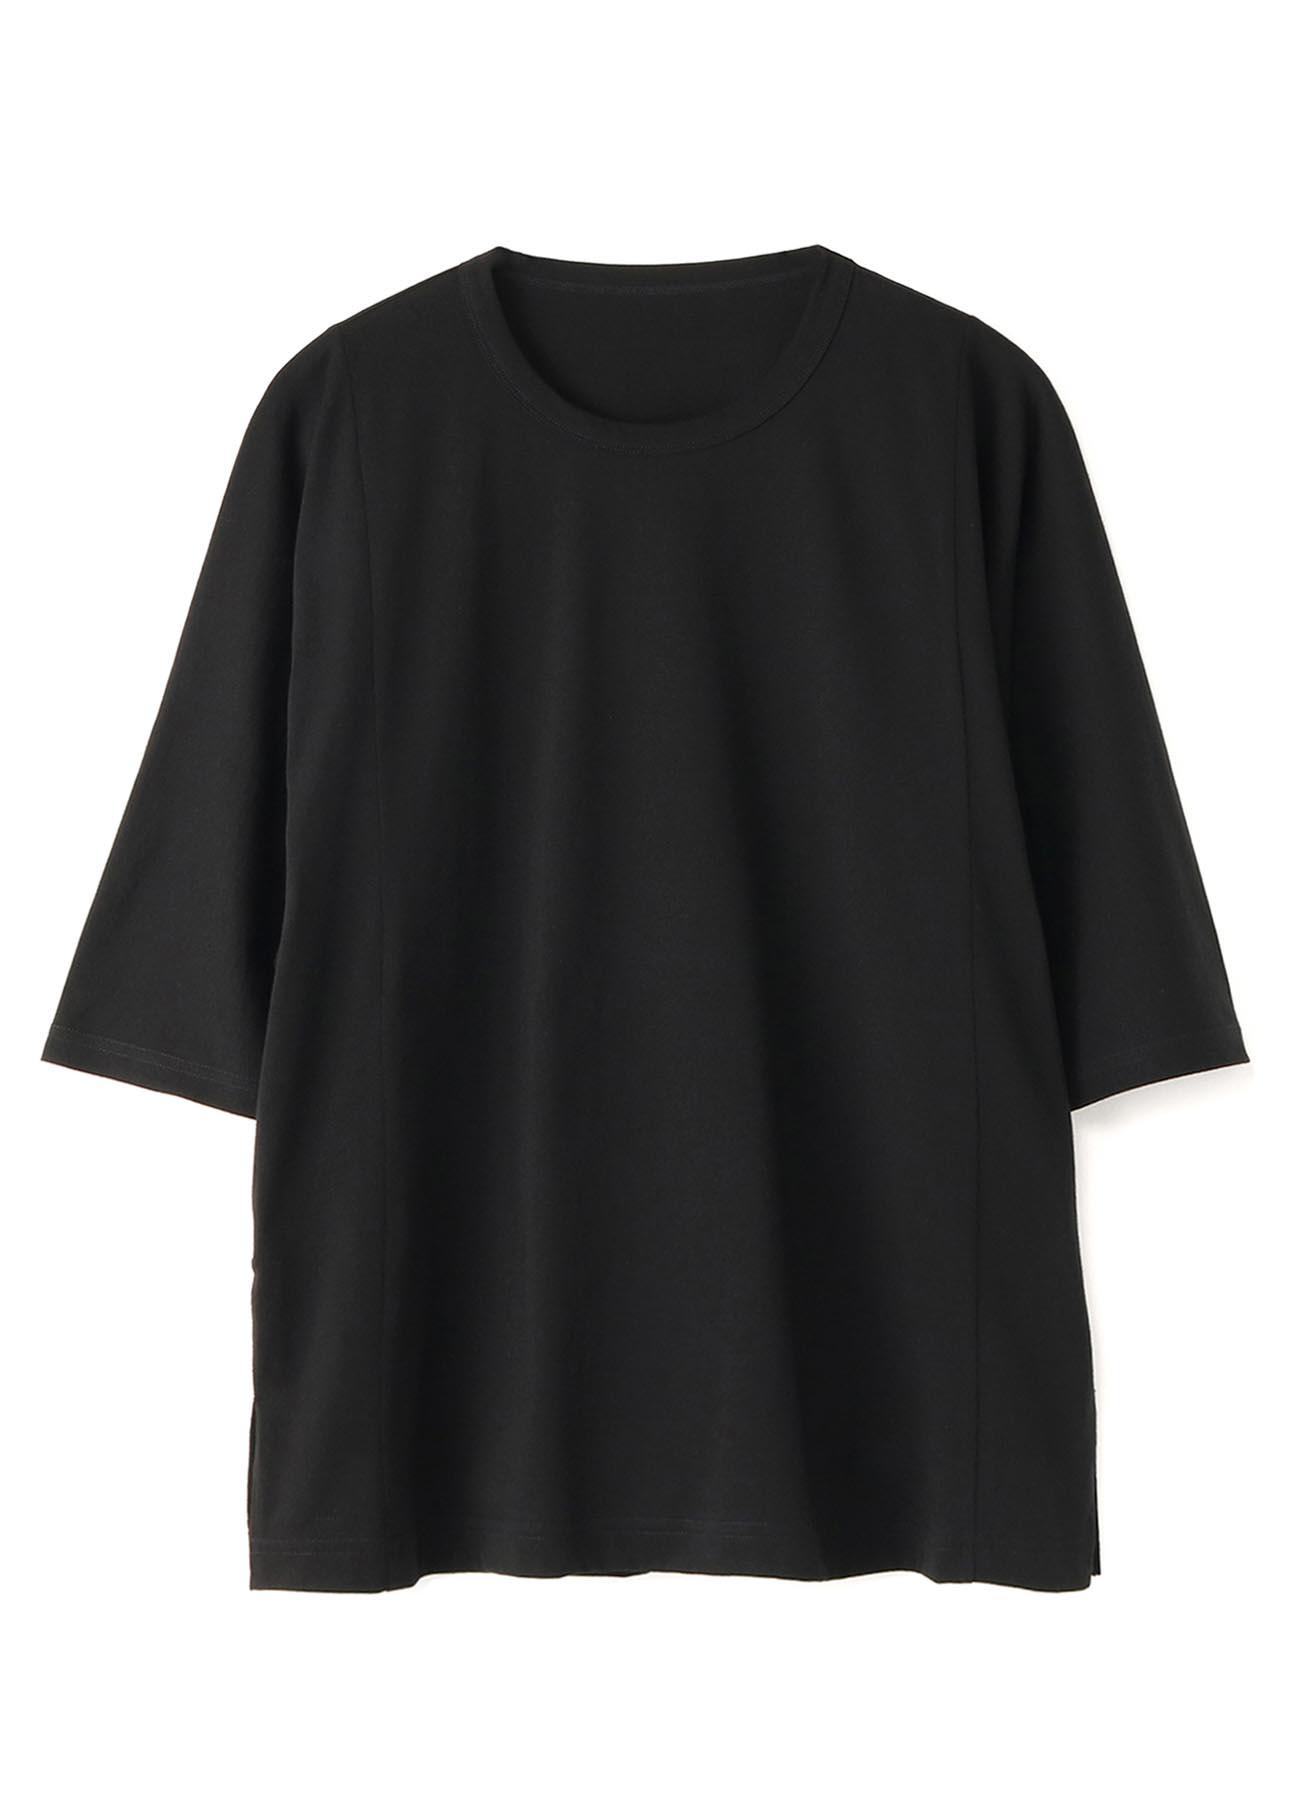 30/Cotton Jersey Three-Quarter Sleeves Cut Sew